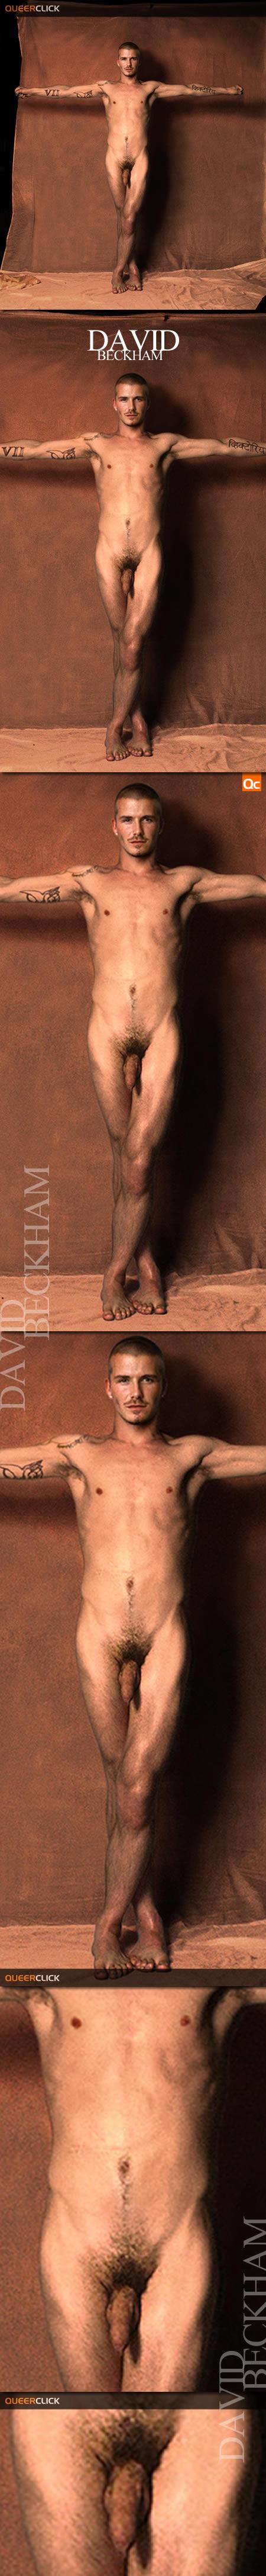 david-beckham-nude.jpg